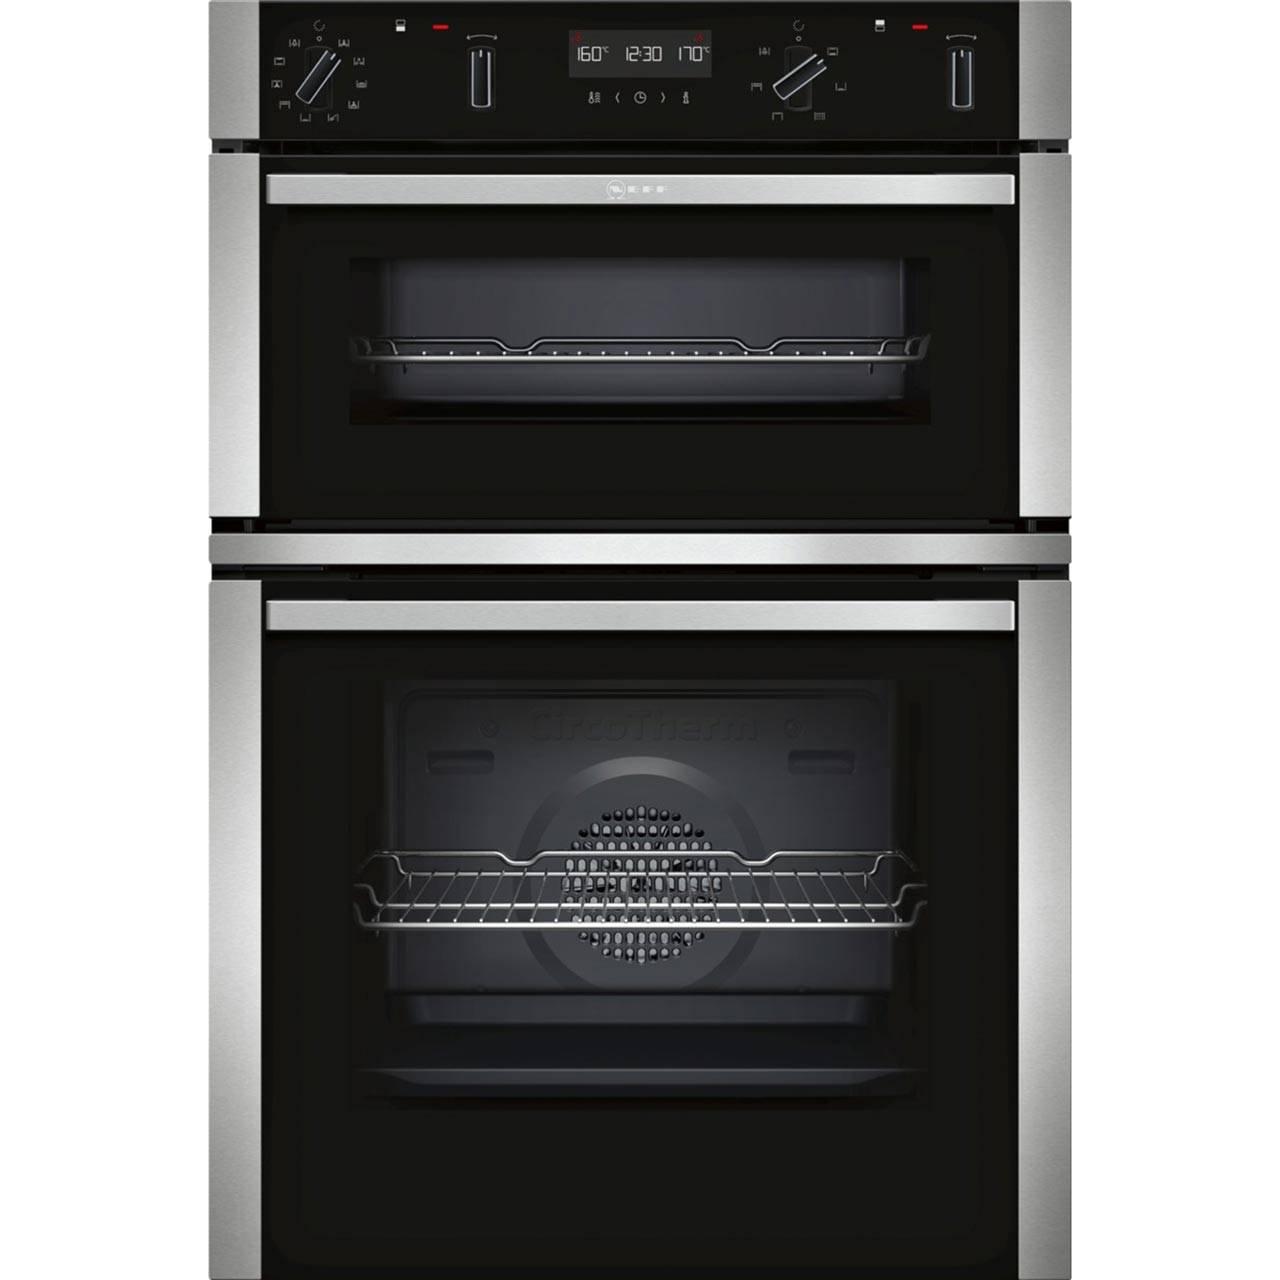 Neff U2ACM7HNOB builtin double oven